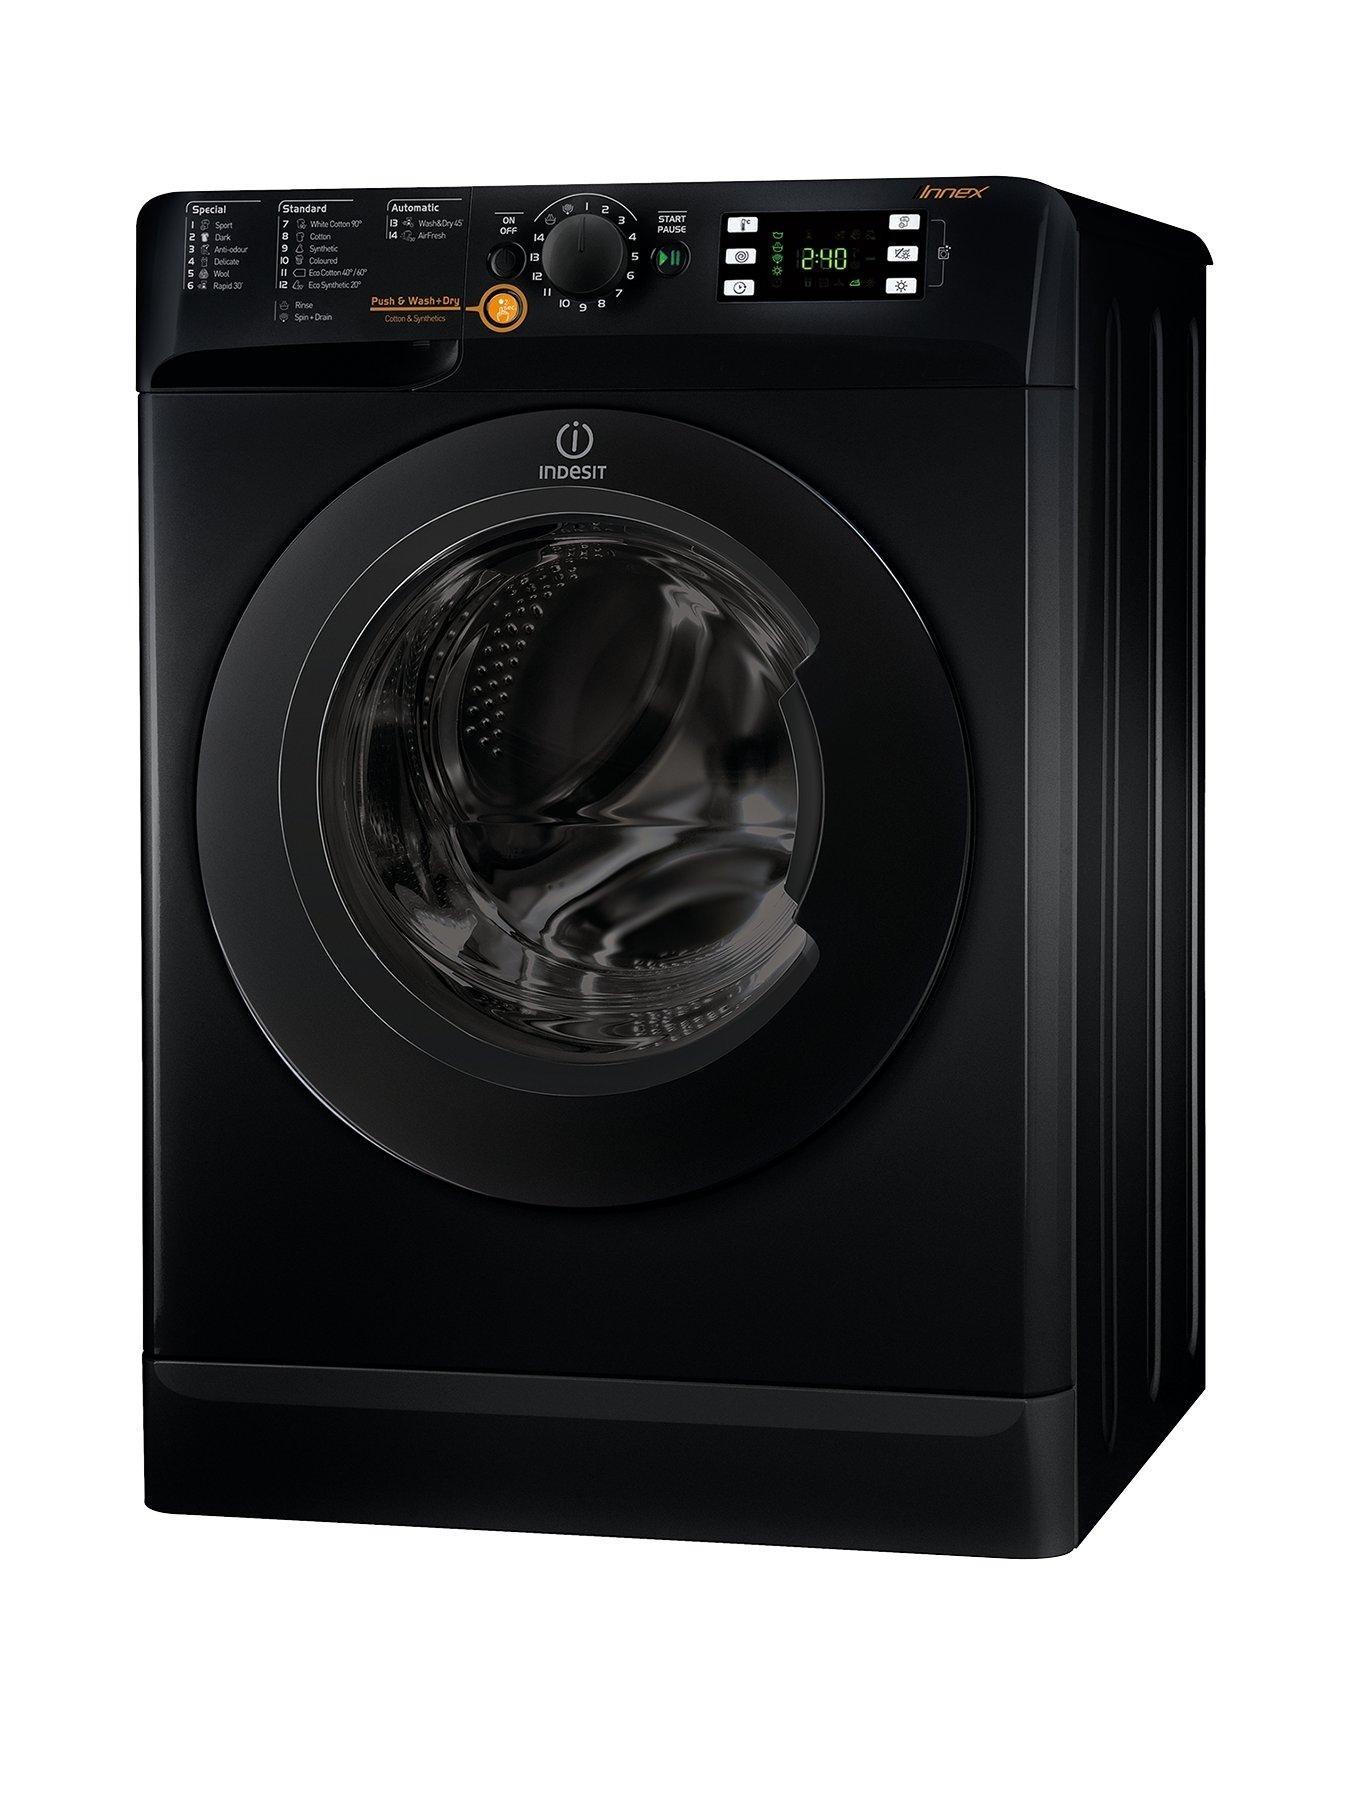 Indesit XWDE861480XK 8kg/6kg 1400rpm Washer-Dryer